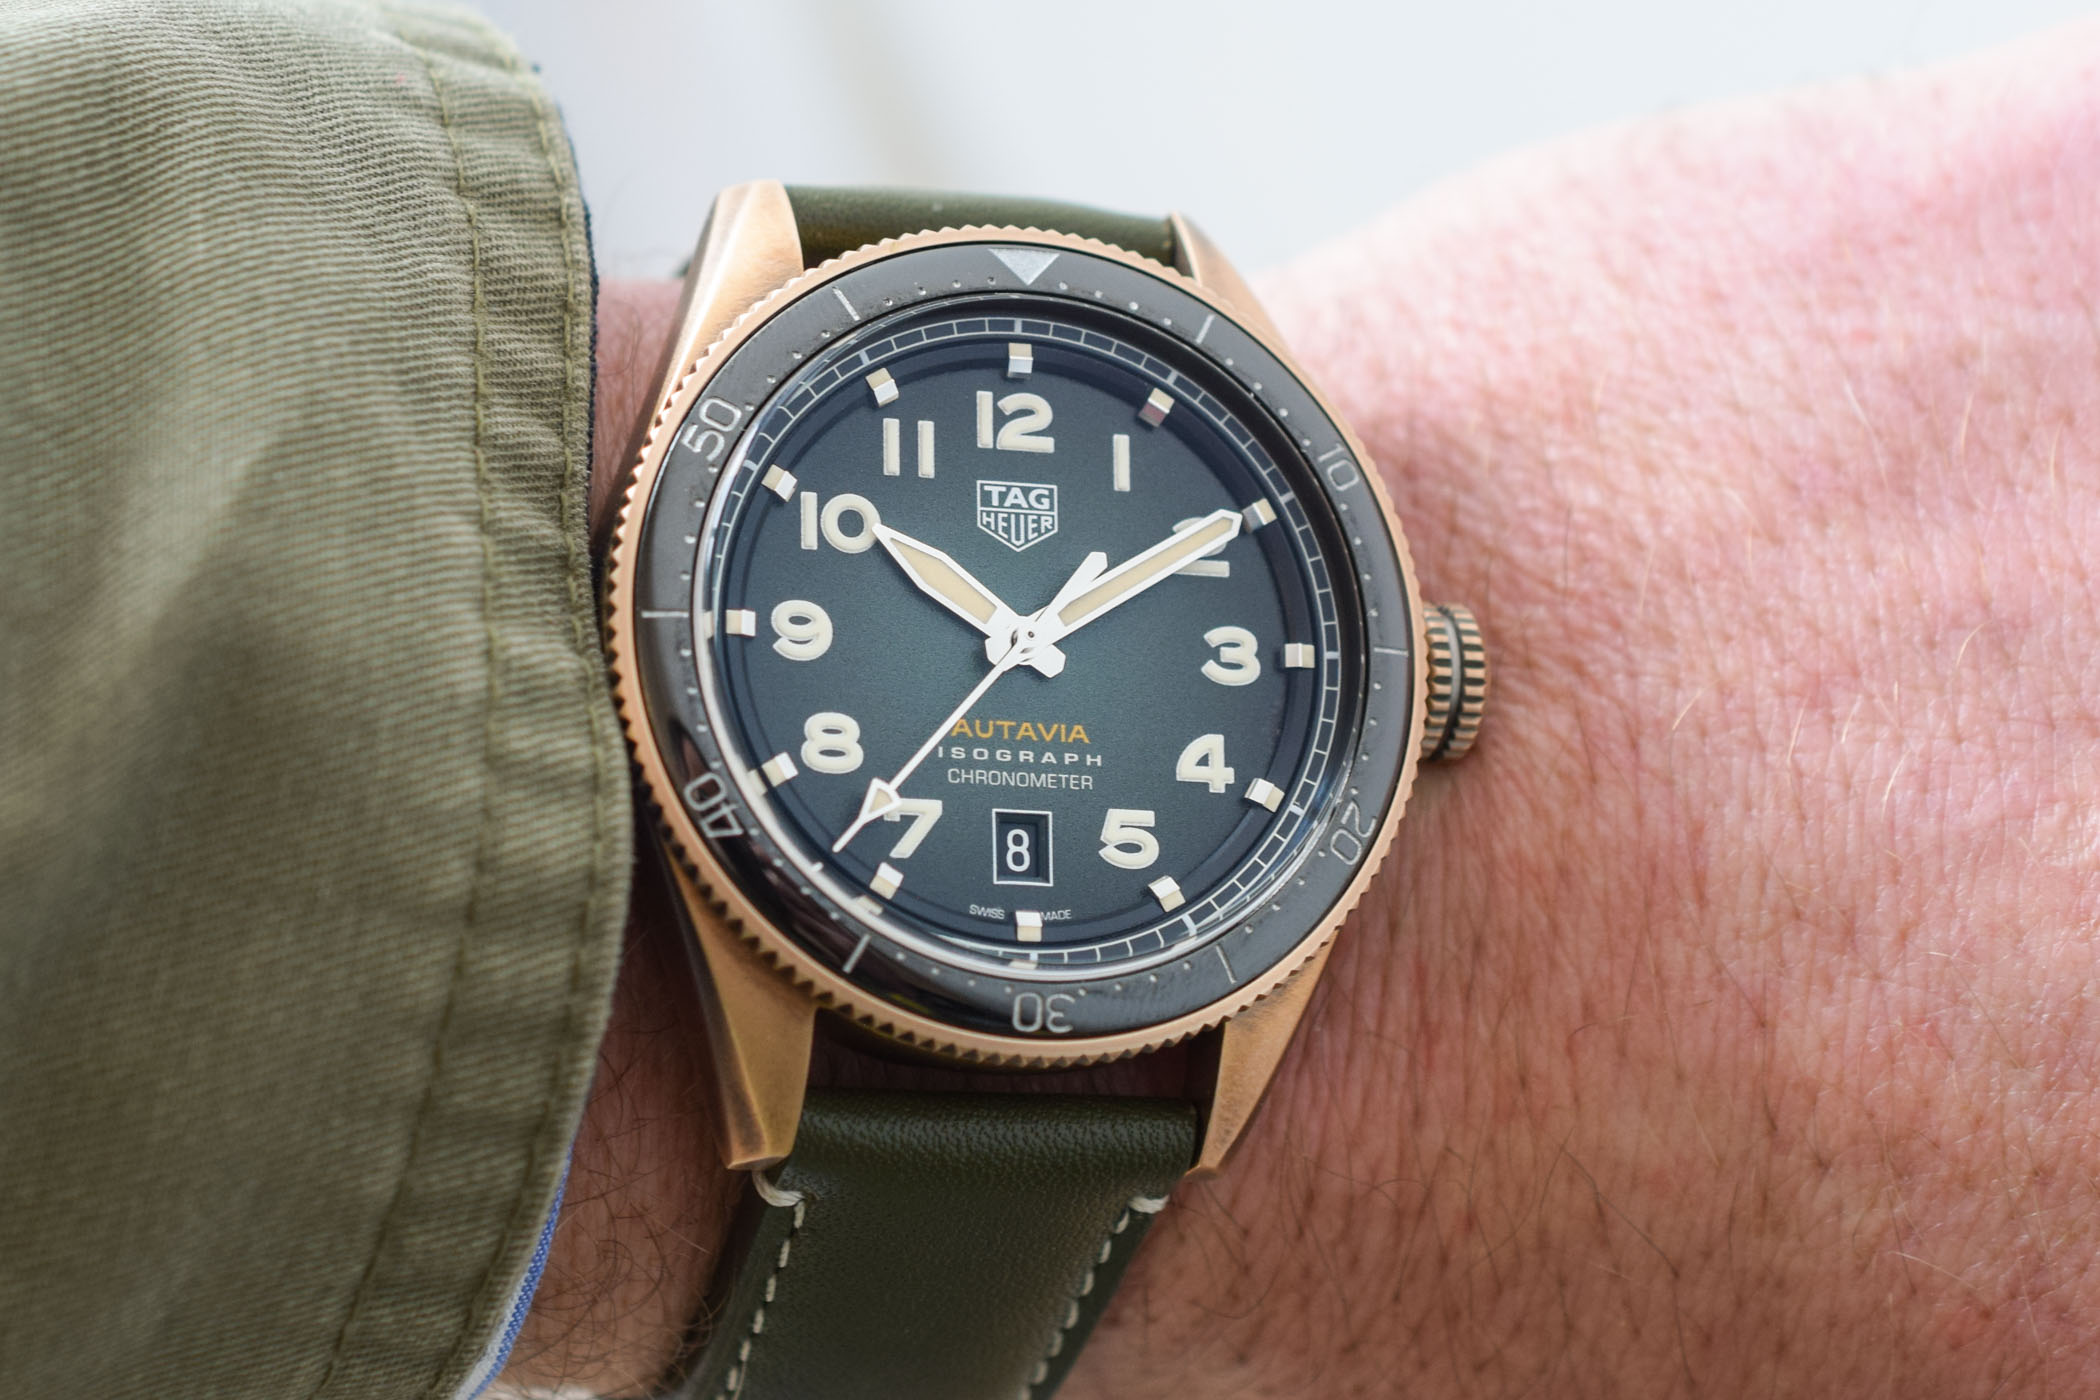 TAG Heuer Autavia Isograph Chronometer - Baselworld 2019 - 11